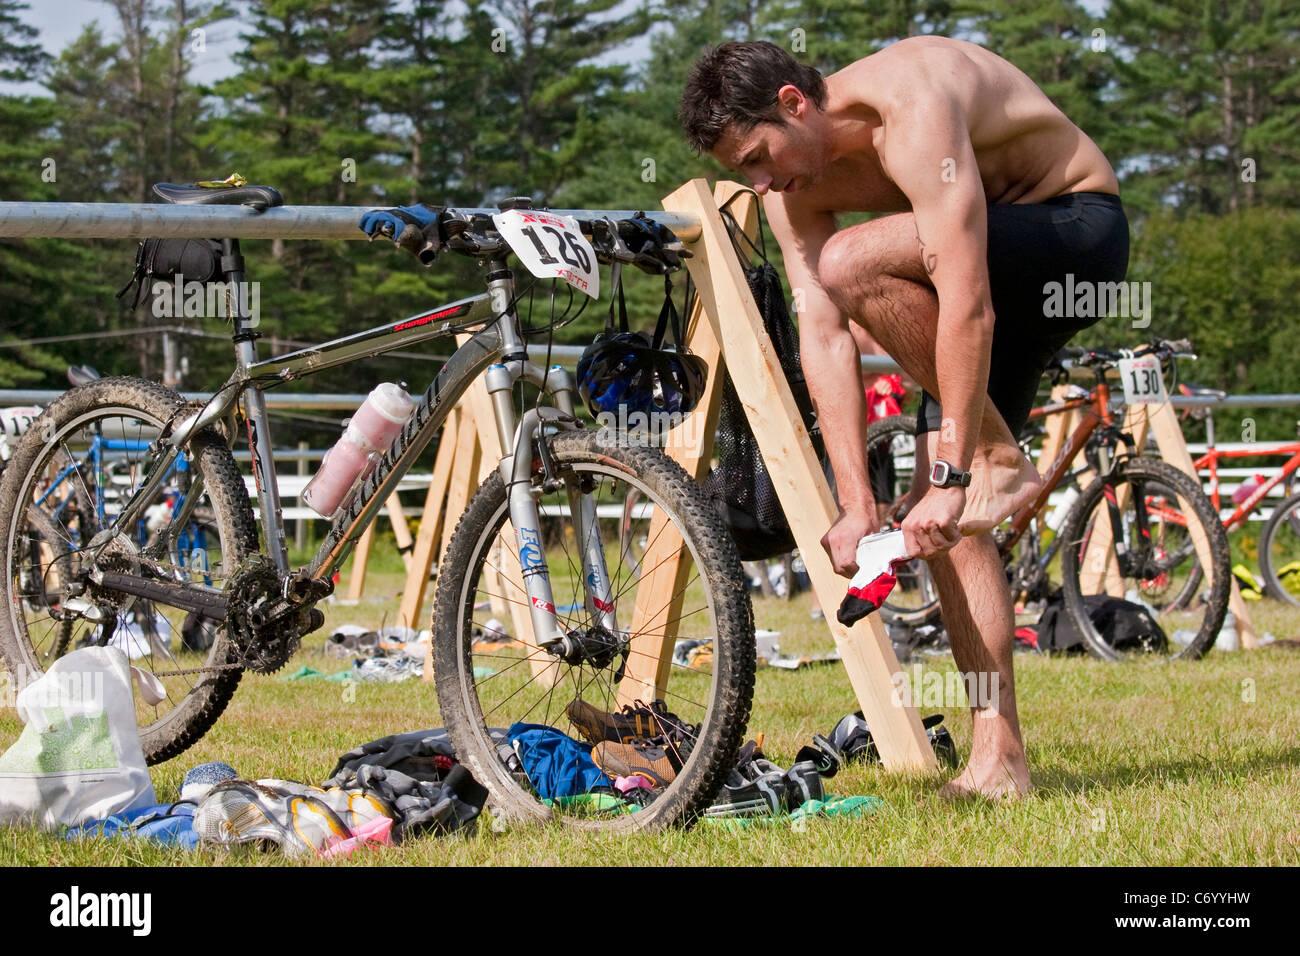 Male triathlon racer changes equipment during off-road triathlon race event before mountain biking - Stock Image